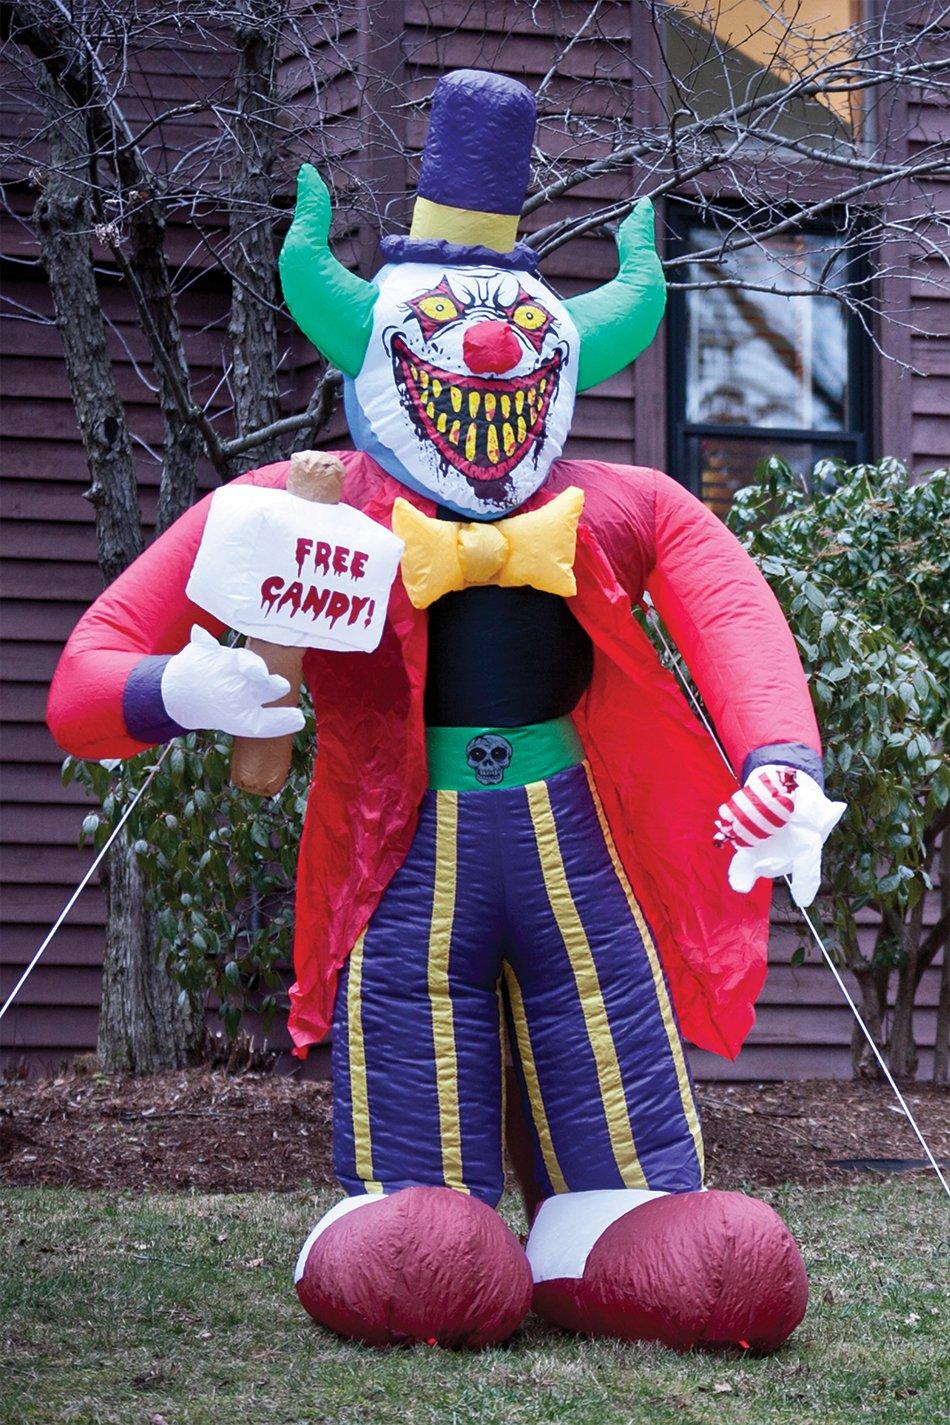 Free Candy Clown Inflatable Decoration Morbid Enterprises m37158